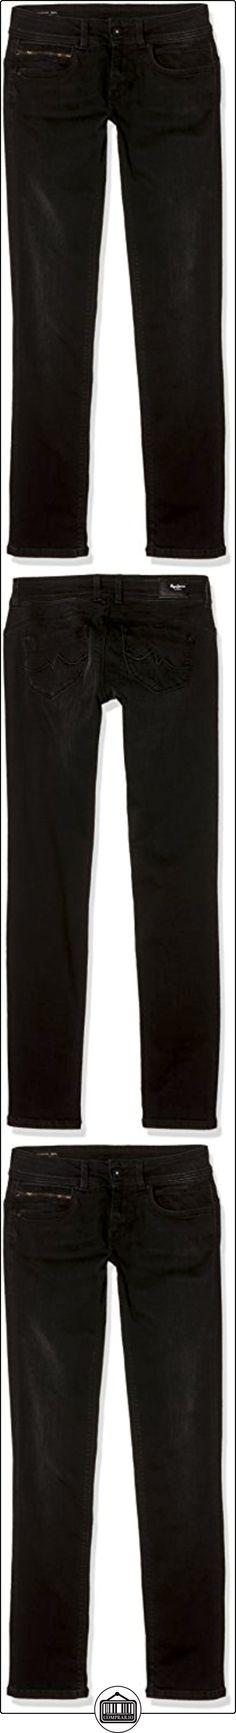 Pepe Jeans New Brooke, Jeans Mujer, Azul (Denim), 34(UK)  ✿ Vaqueros ✿